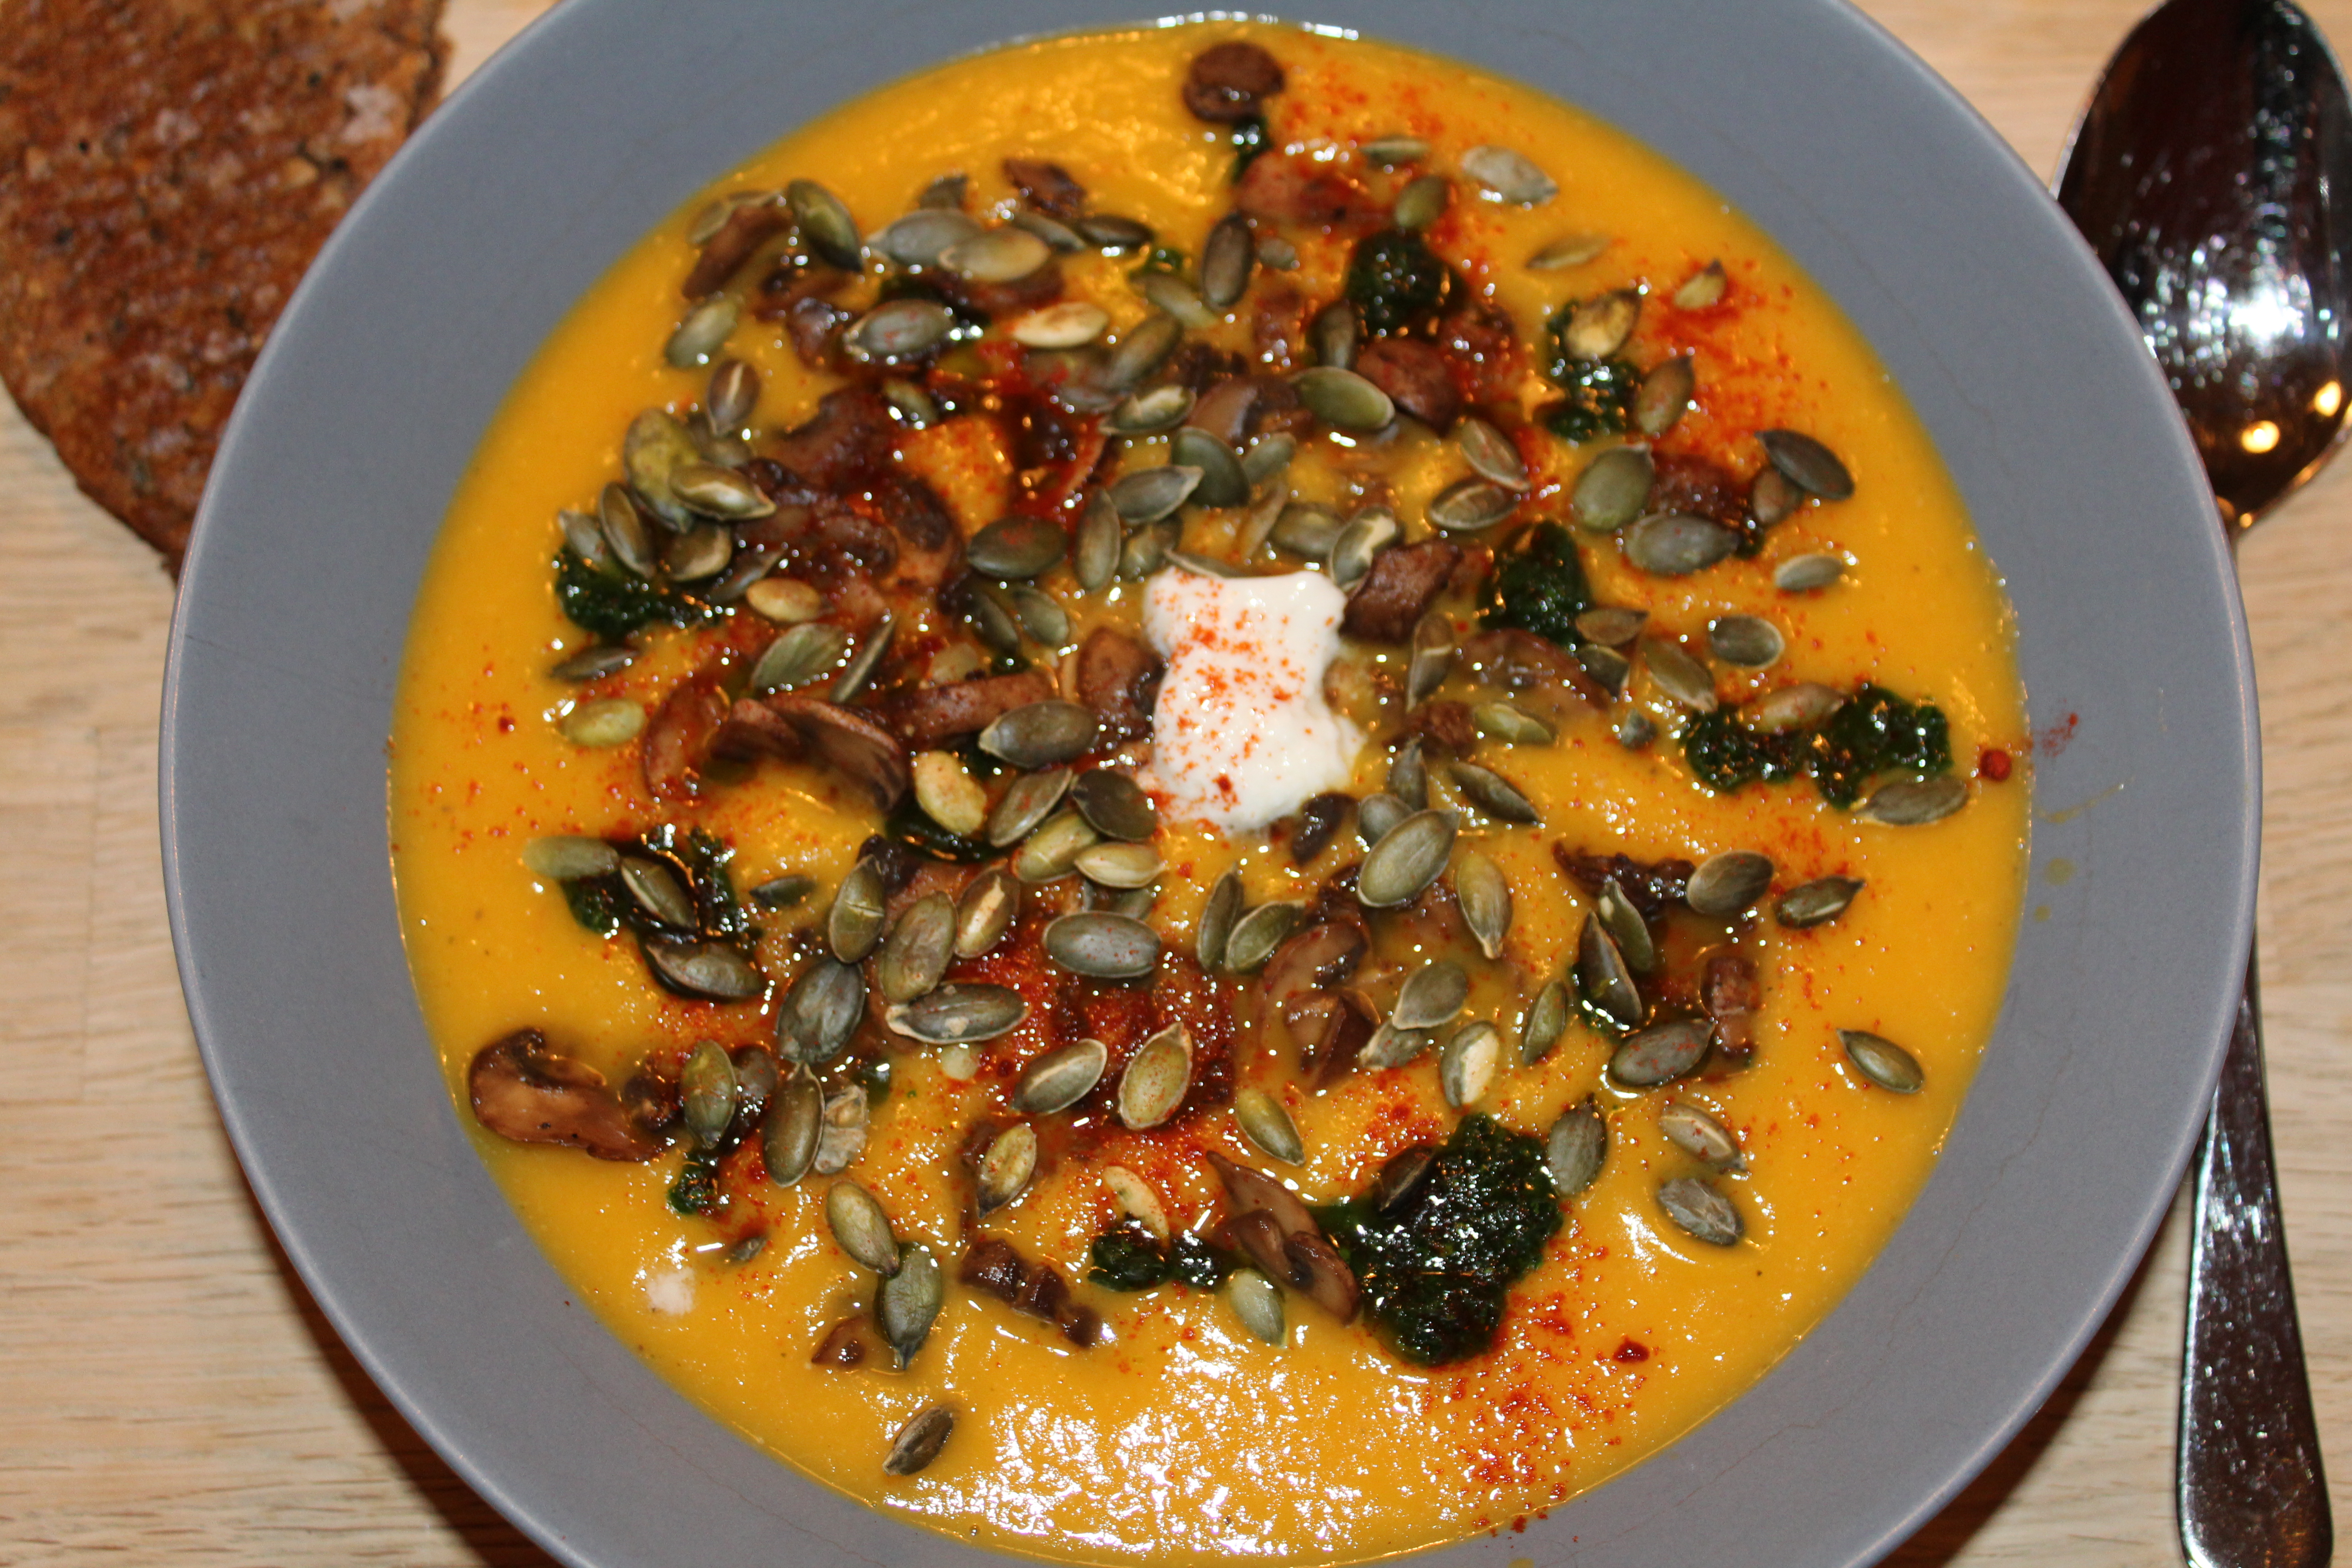 Vegansk gulerod-chili-suppe med umamidrys